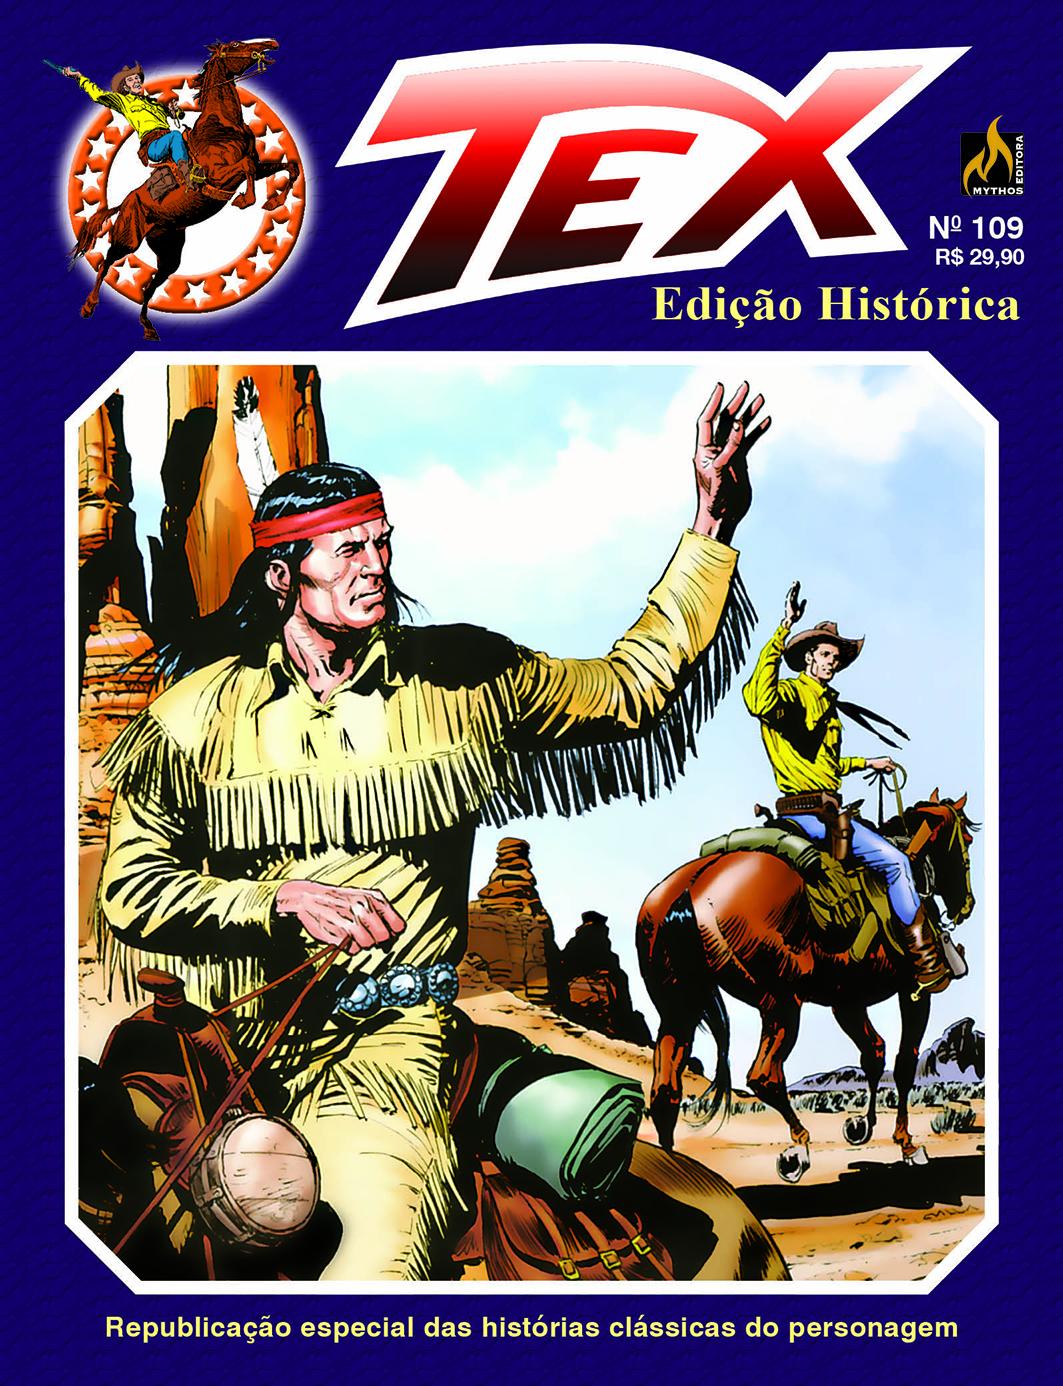 TEX ED HISTORICA Nº 109